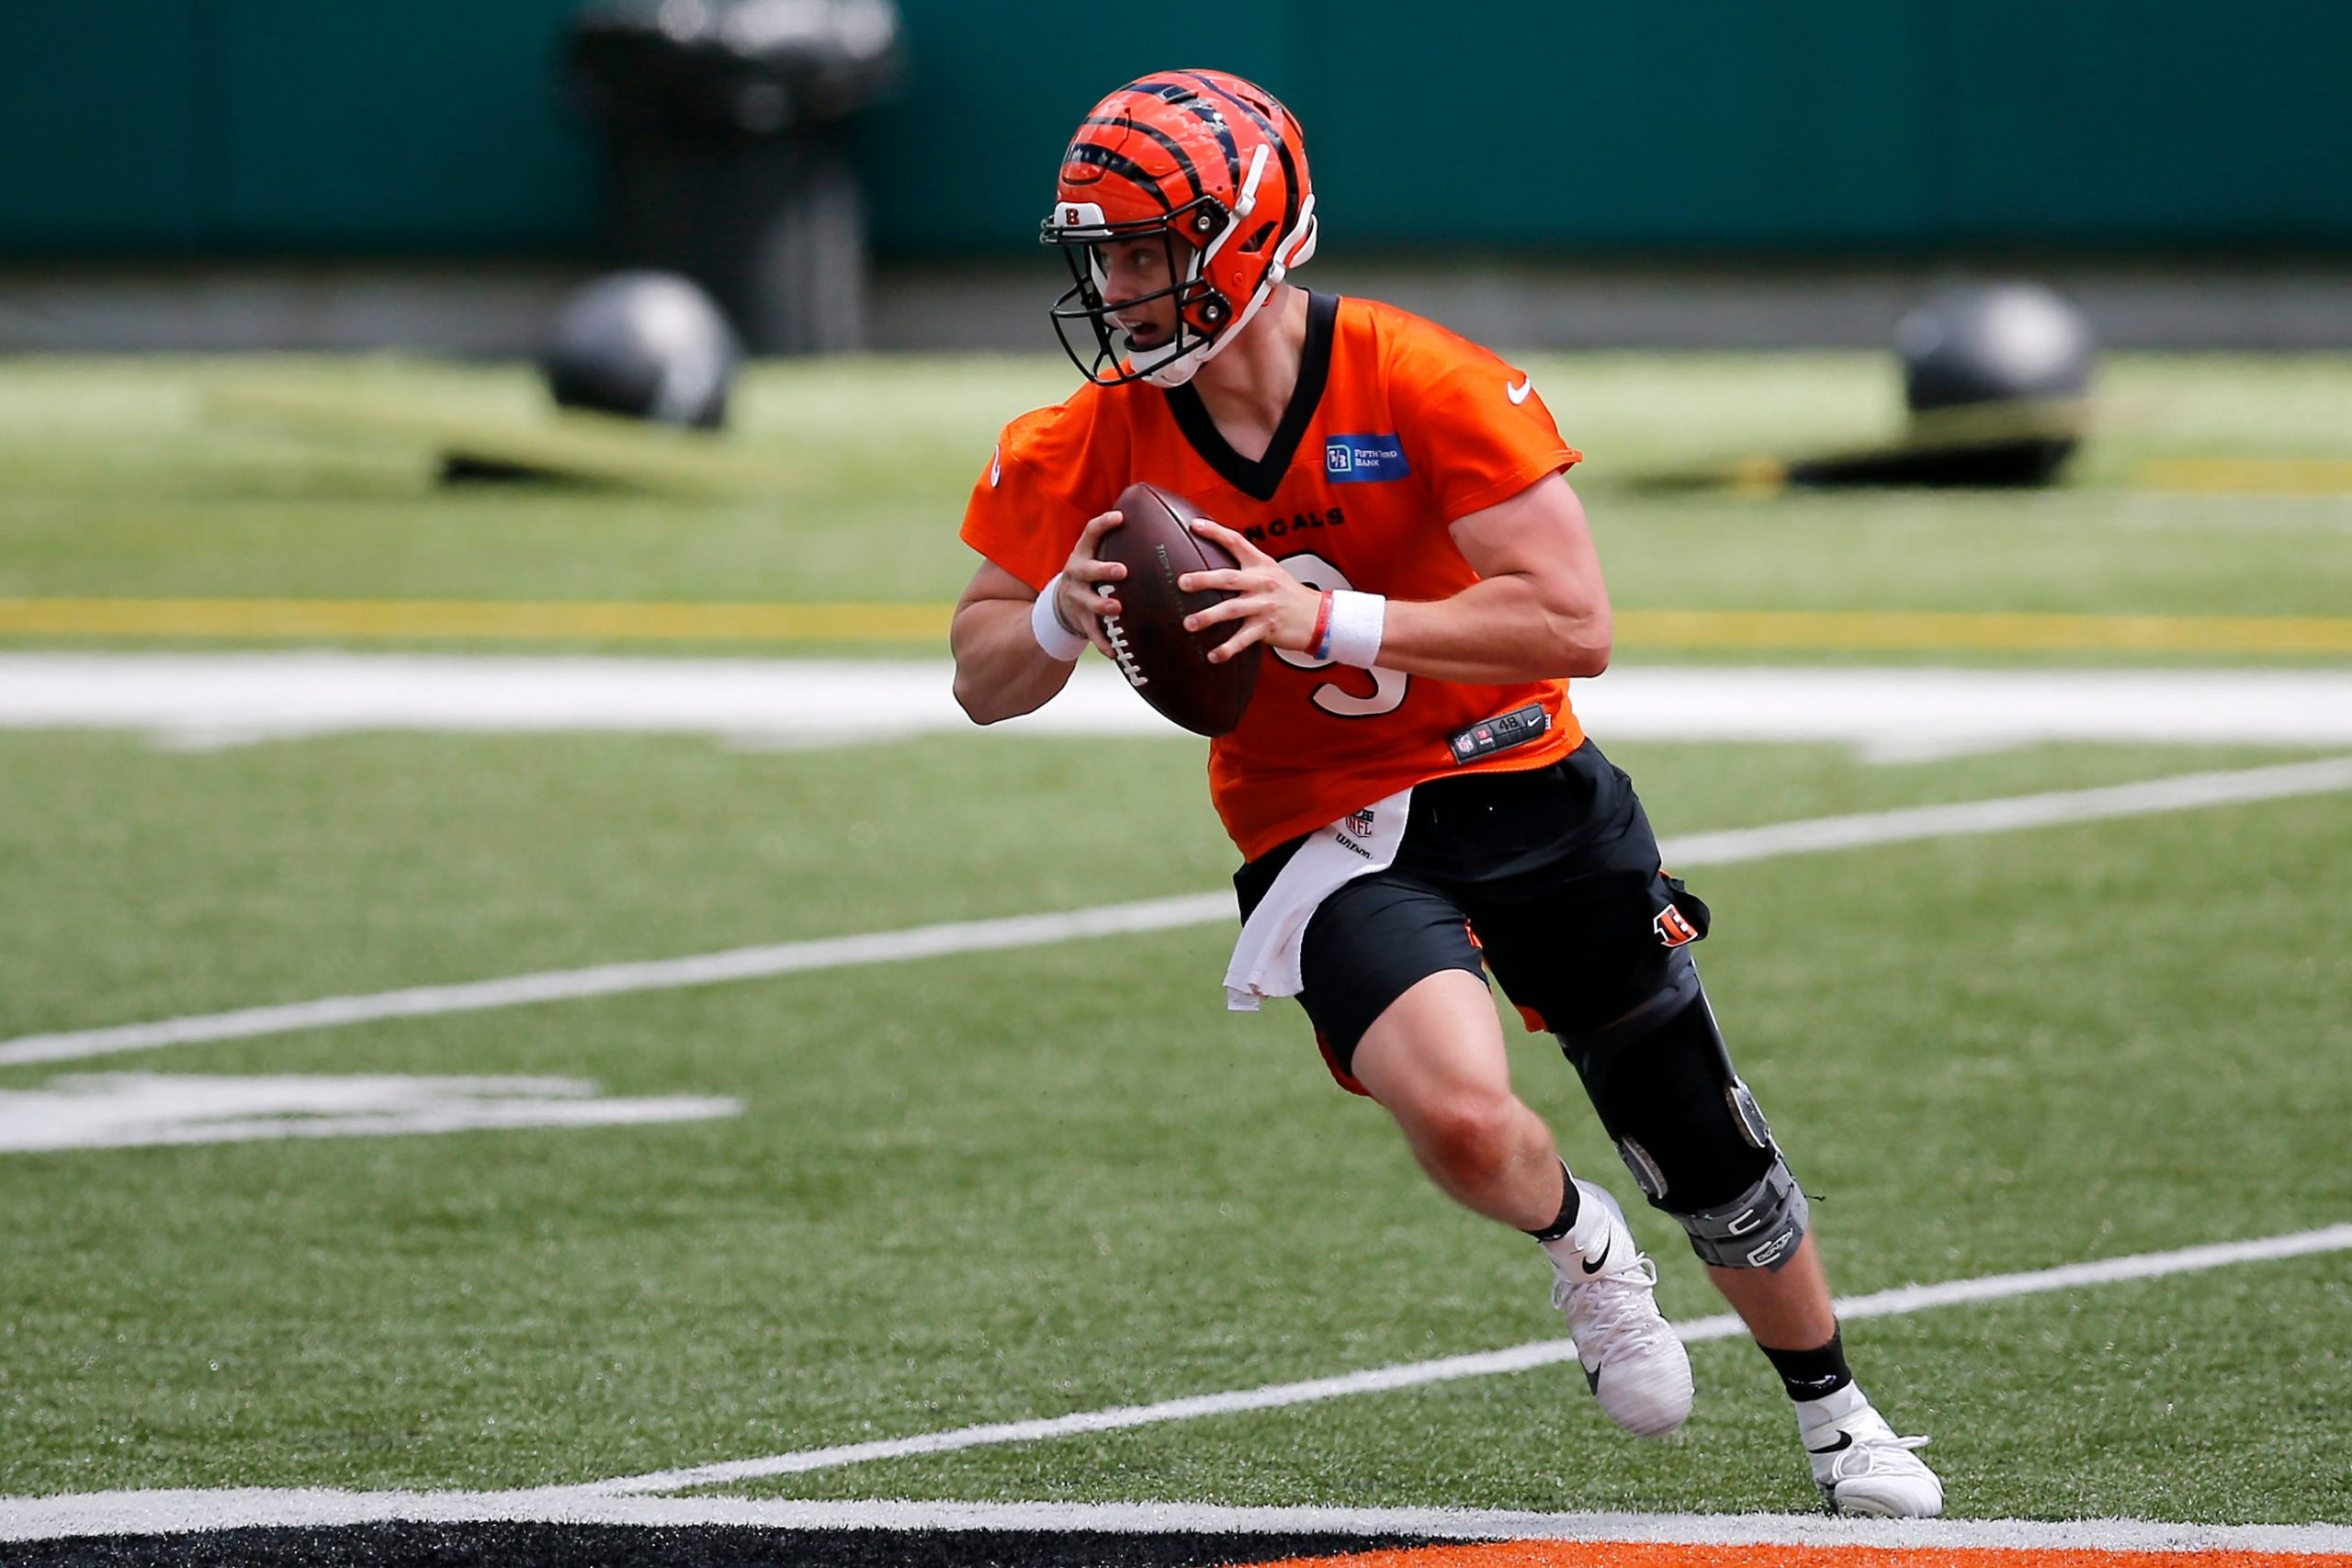 Bengals quarterback Joe Burrow scrambles during a minicamp practice at Paul Brown Stadium in Cincinnati on Tuesday. Cincinnati Bengals Mini Camp.